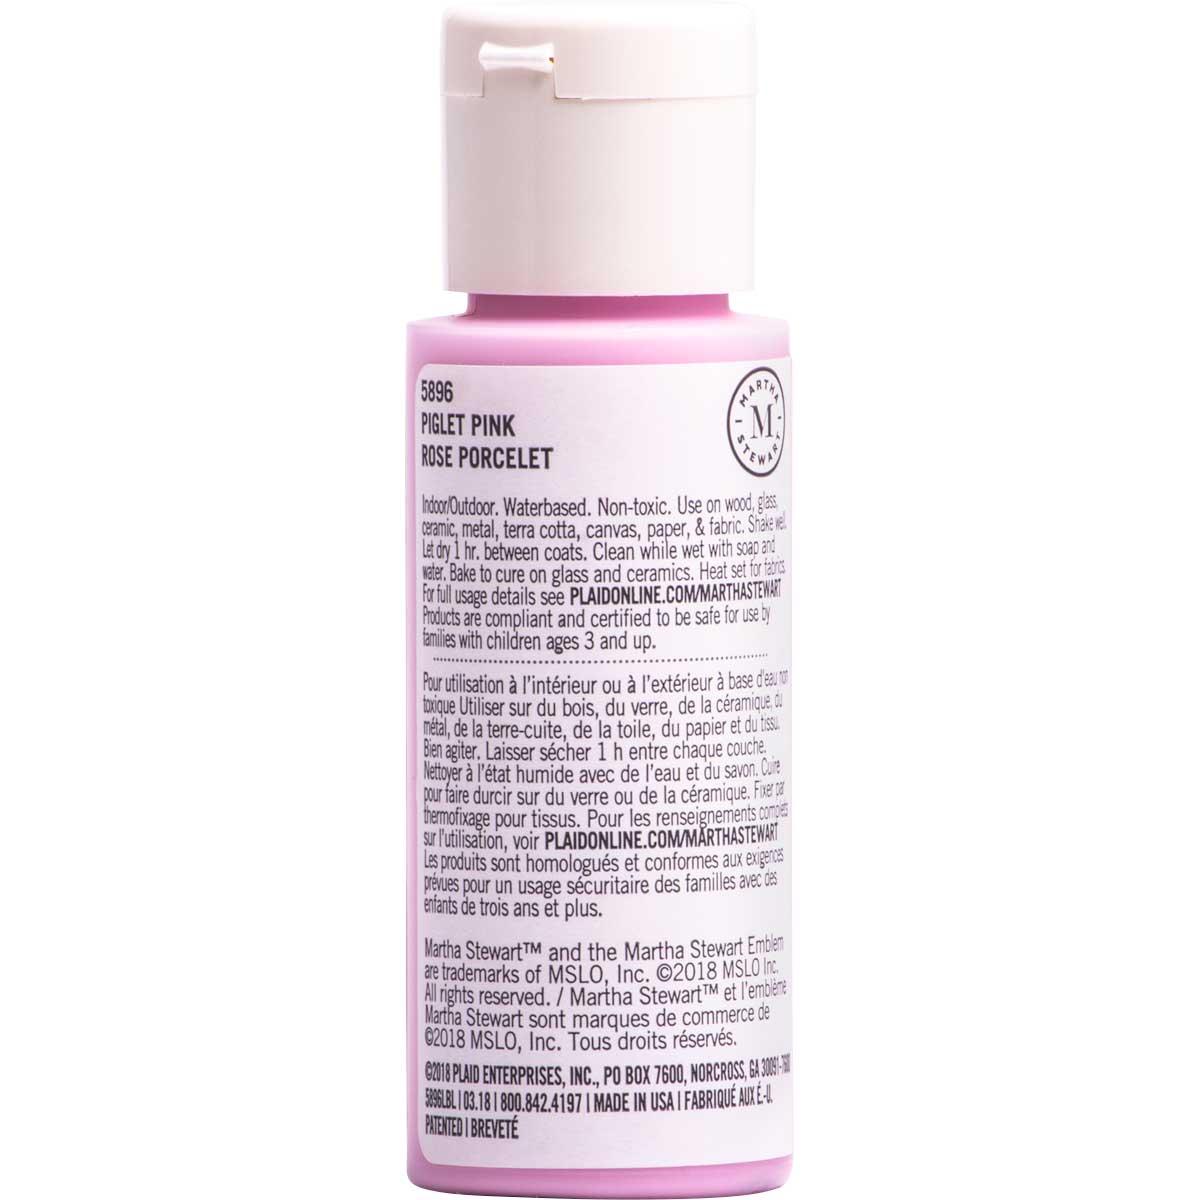 Martha Stewart ® Multi-Surface Satin Acrylic Craft Paint CPSIA - Piglet Pink, 2 oz. - 5896